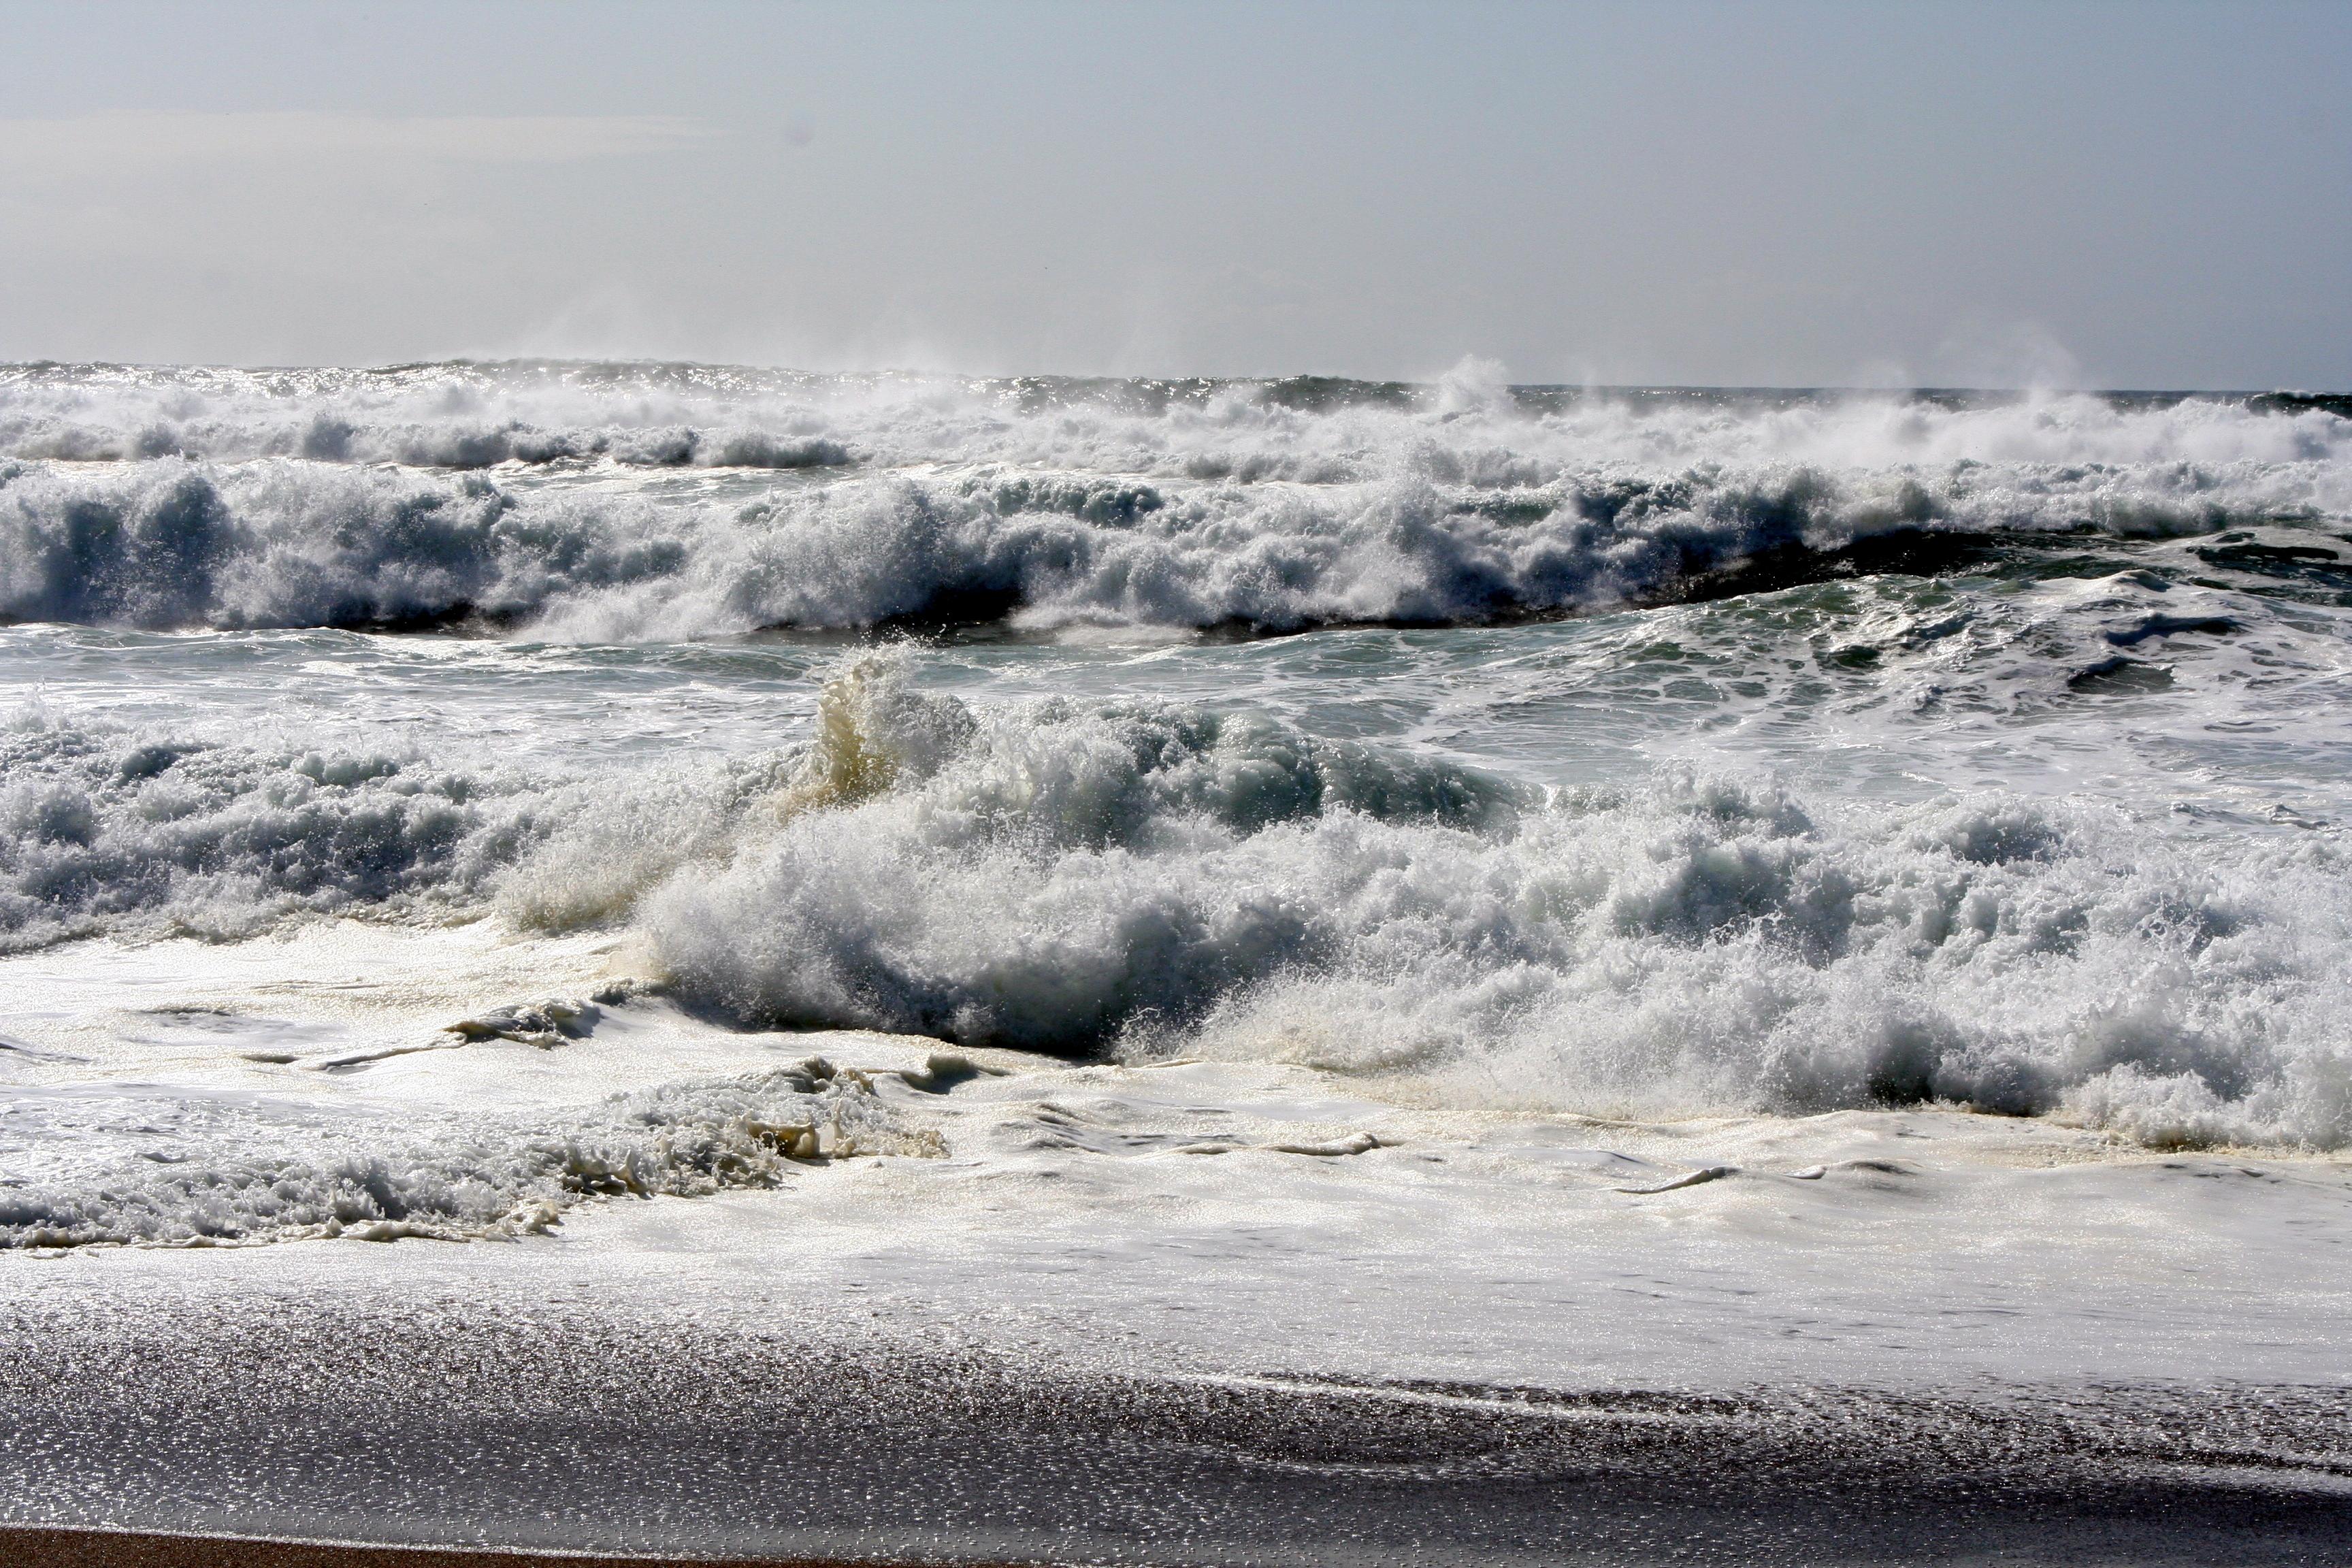 Waves at South Beach, Pt. Reyes National Seashore. Photo by Curtis Mekemson.